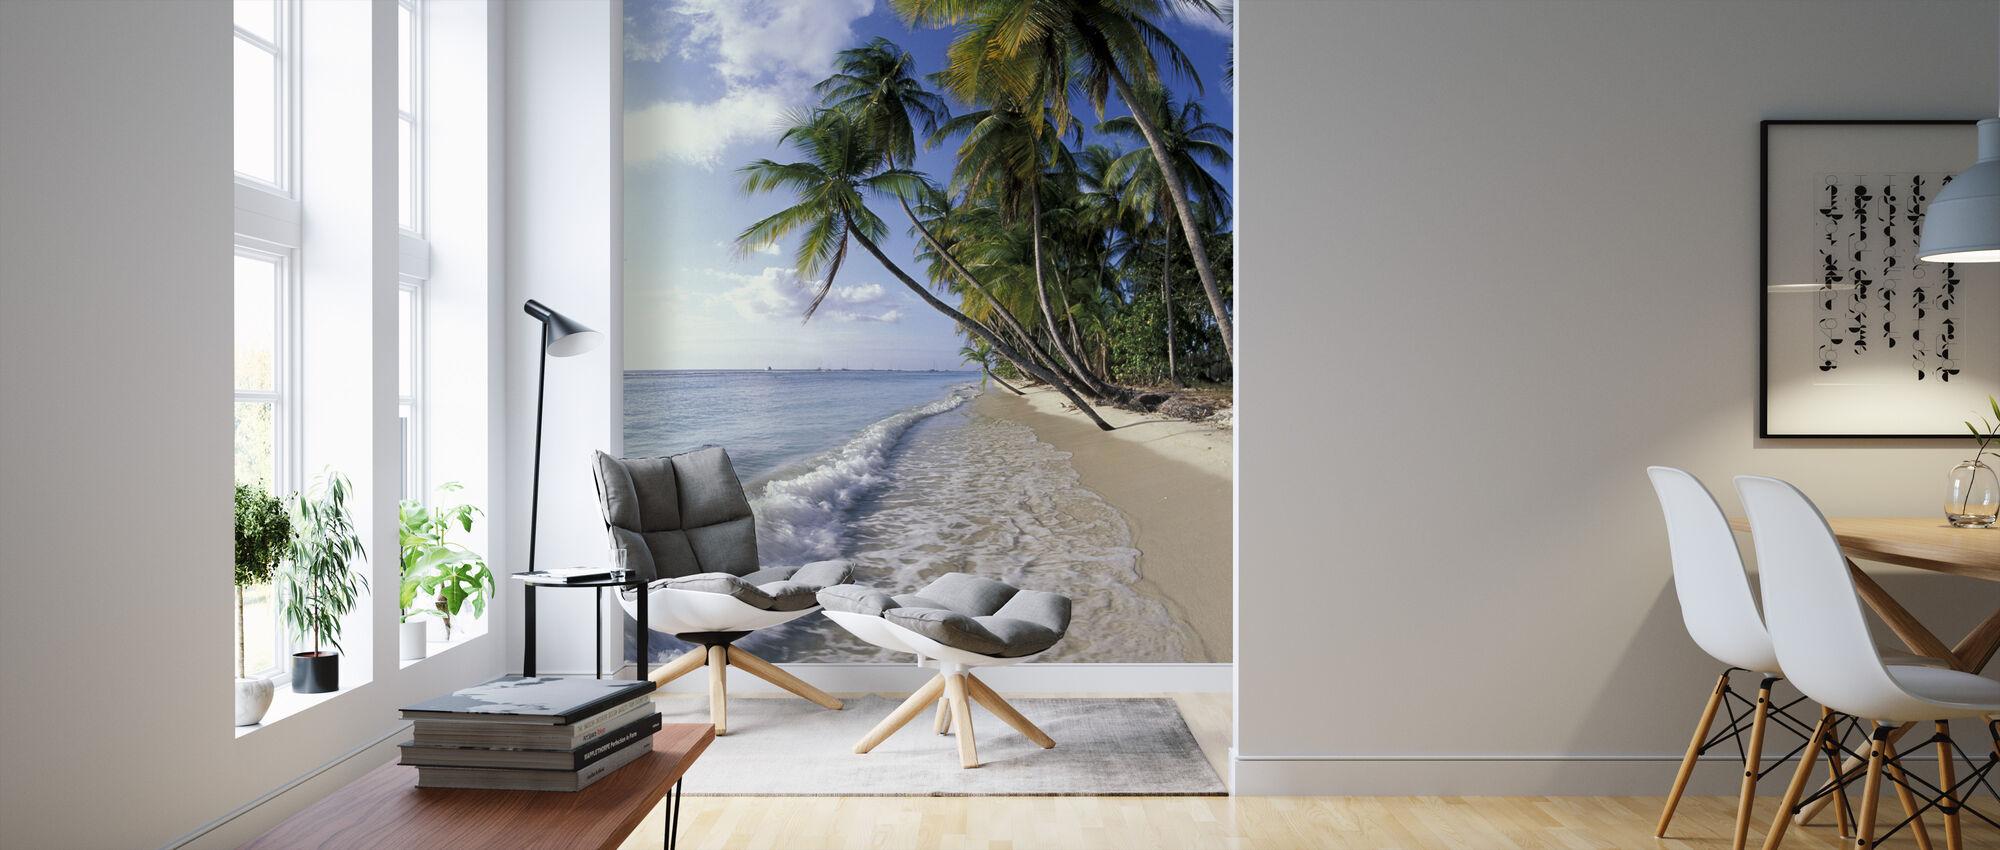 Tropical Seashore - Wallpaper - Living Room